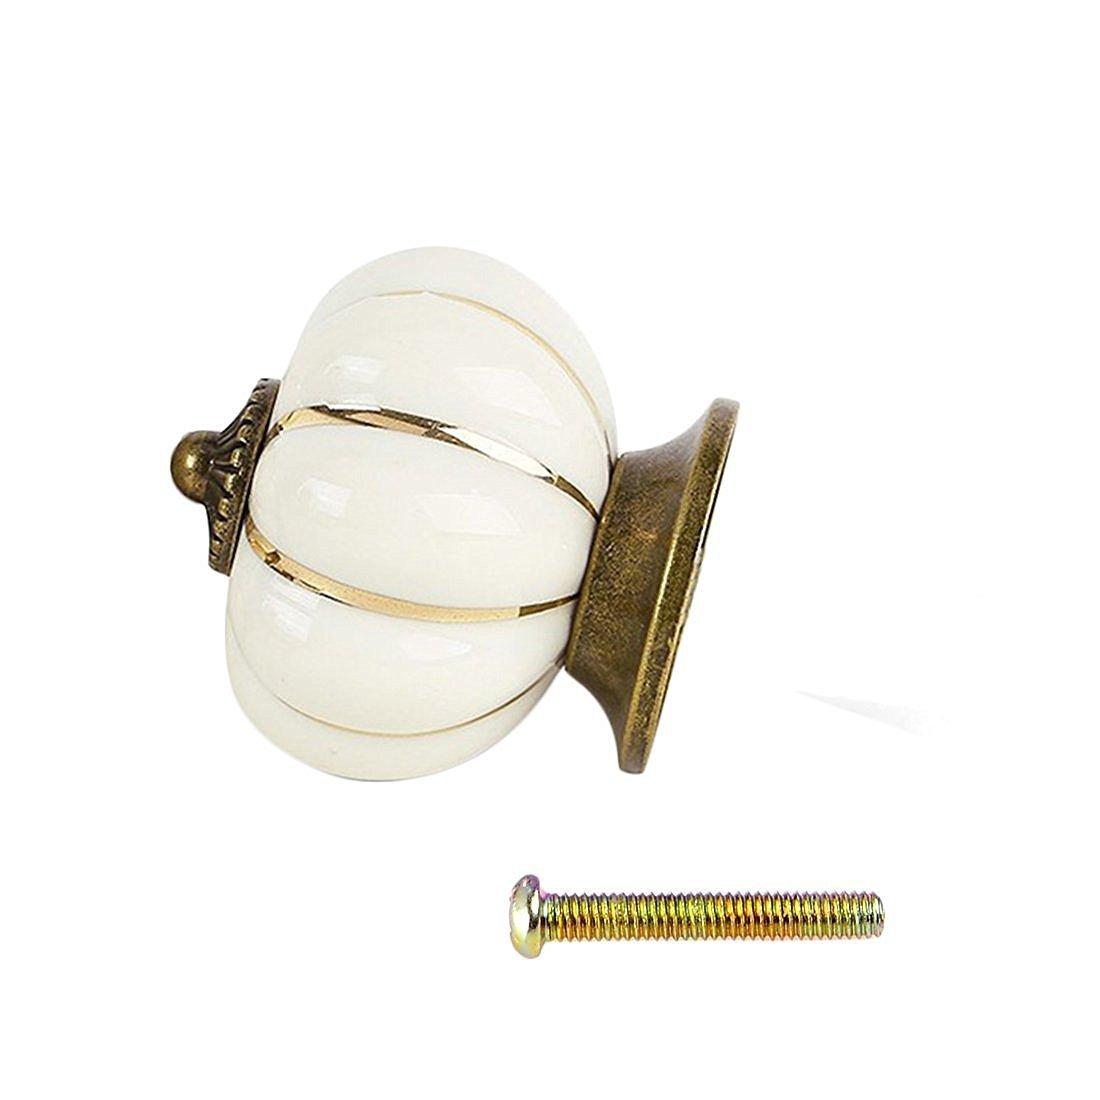 Pumpkin Ceramic Drawer Knobs, YIFAN Set of 10 Cabinet Pulls Dresser Cupboard Door Handles - White 2